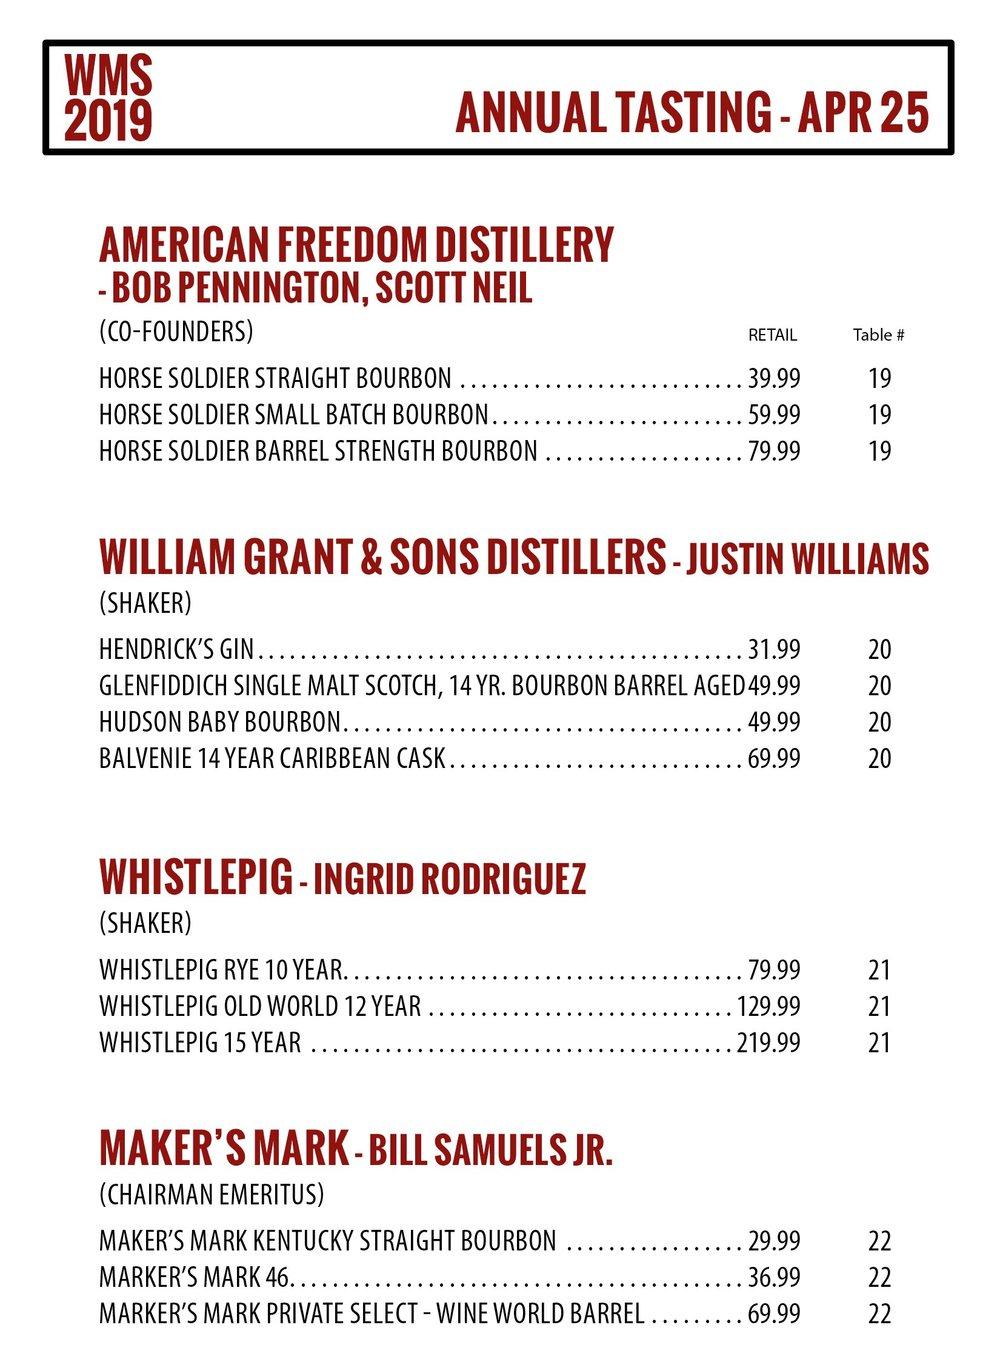 Winemakers+and+Shakers_Tasting+Guide_20199.jpg